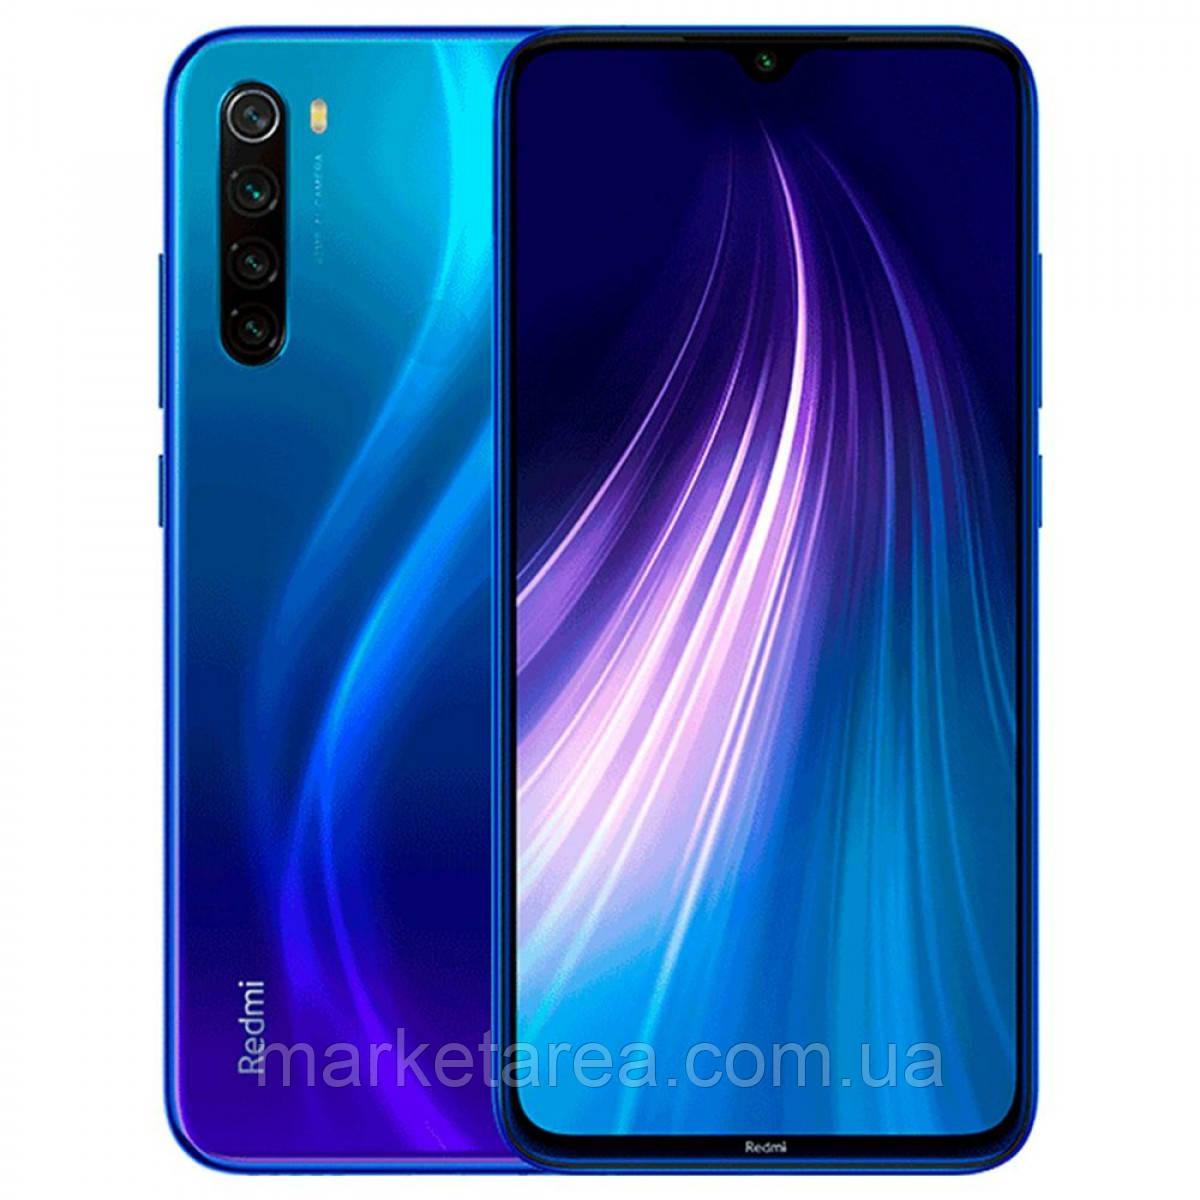 Смартфон ксиоми синий с хорошим аккумулятором большой емкости Xiaomi Redmi NOTE 8 4/64Gb blue Global Version